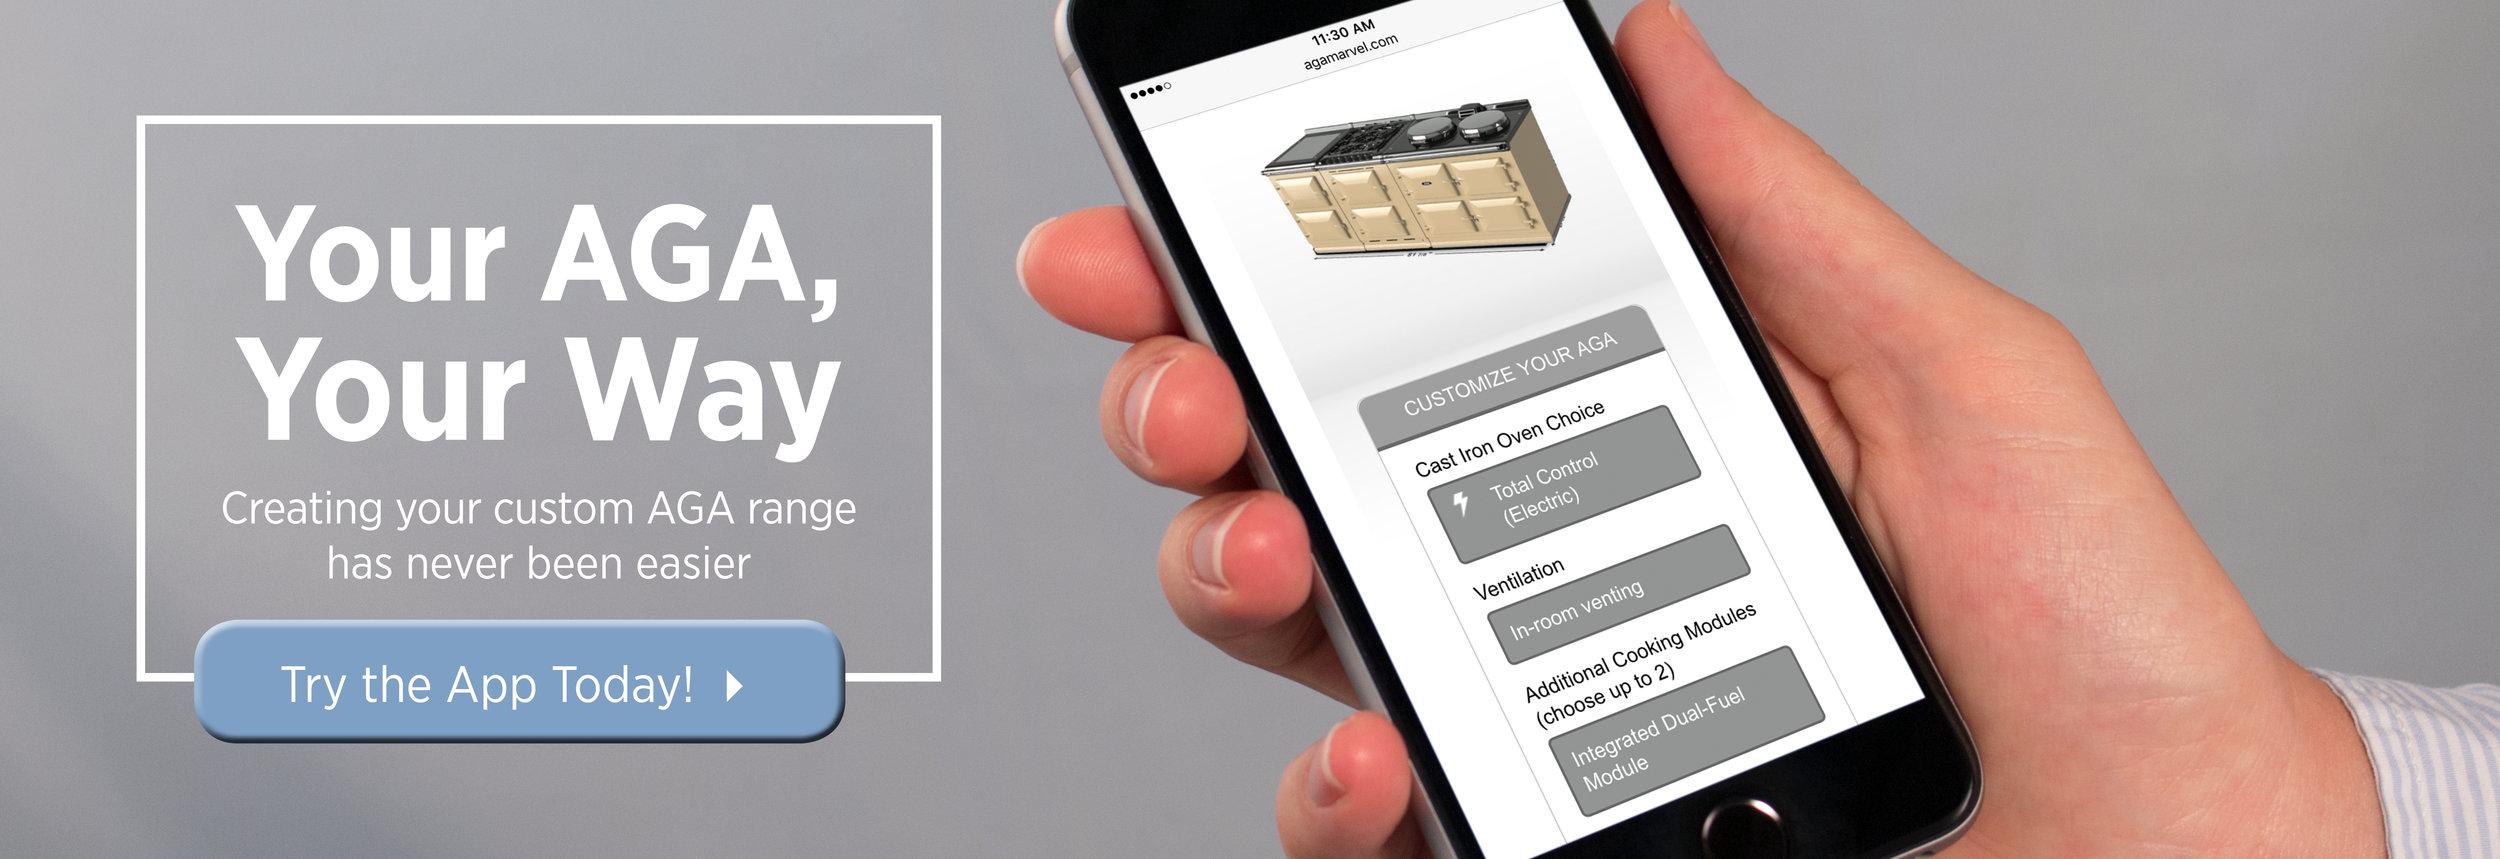 web banner - build your aga.jpg